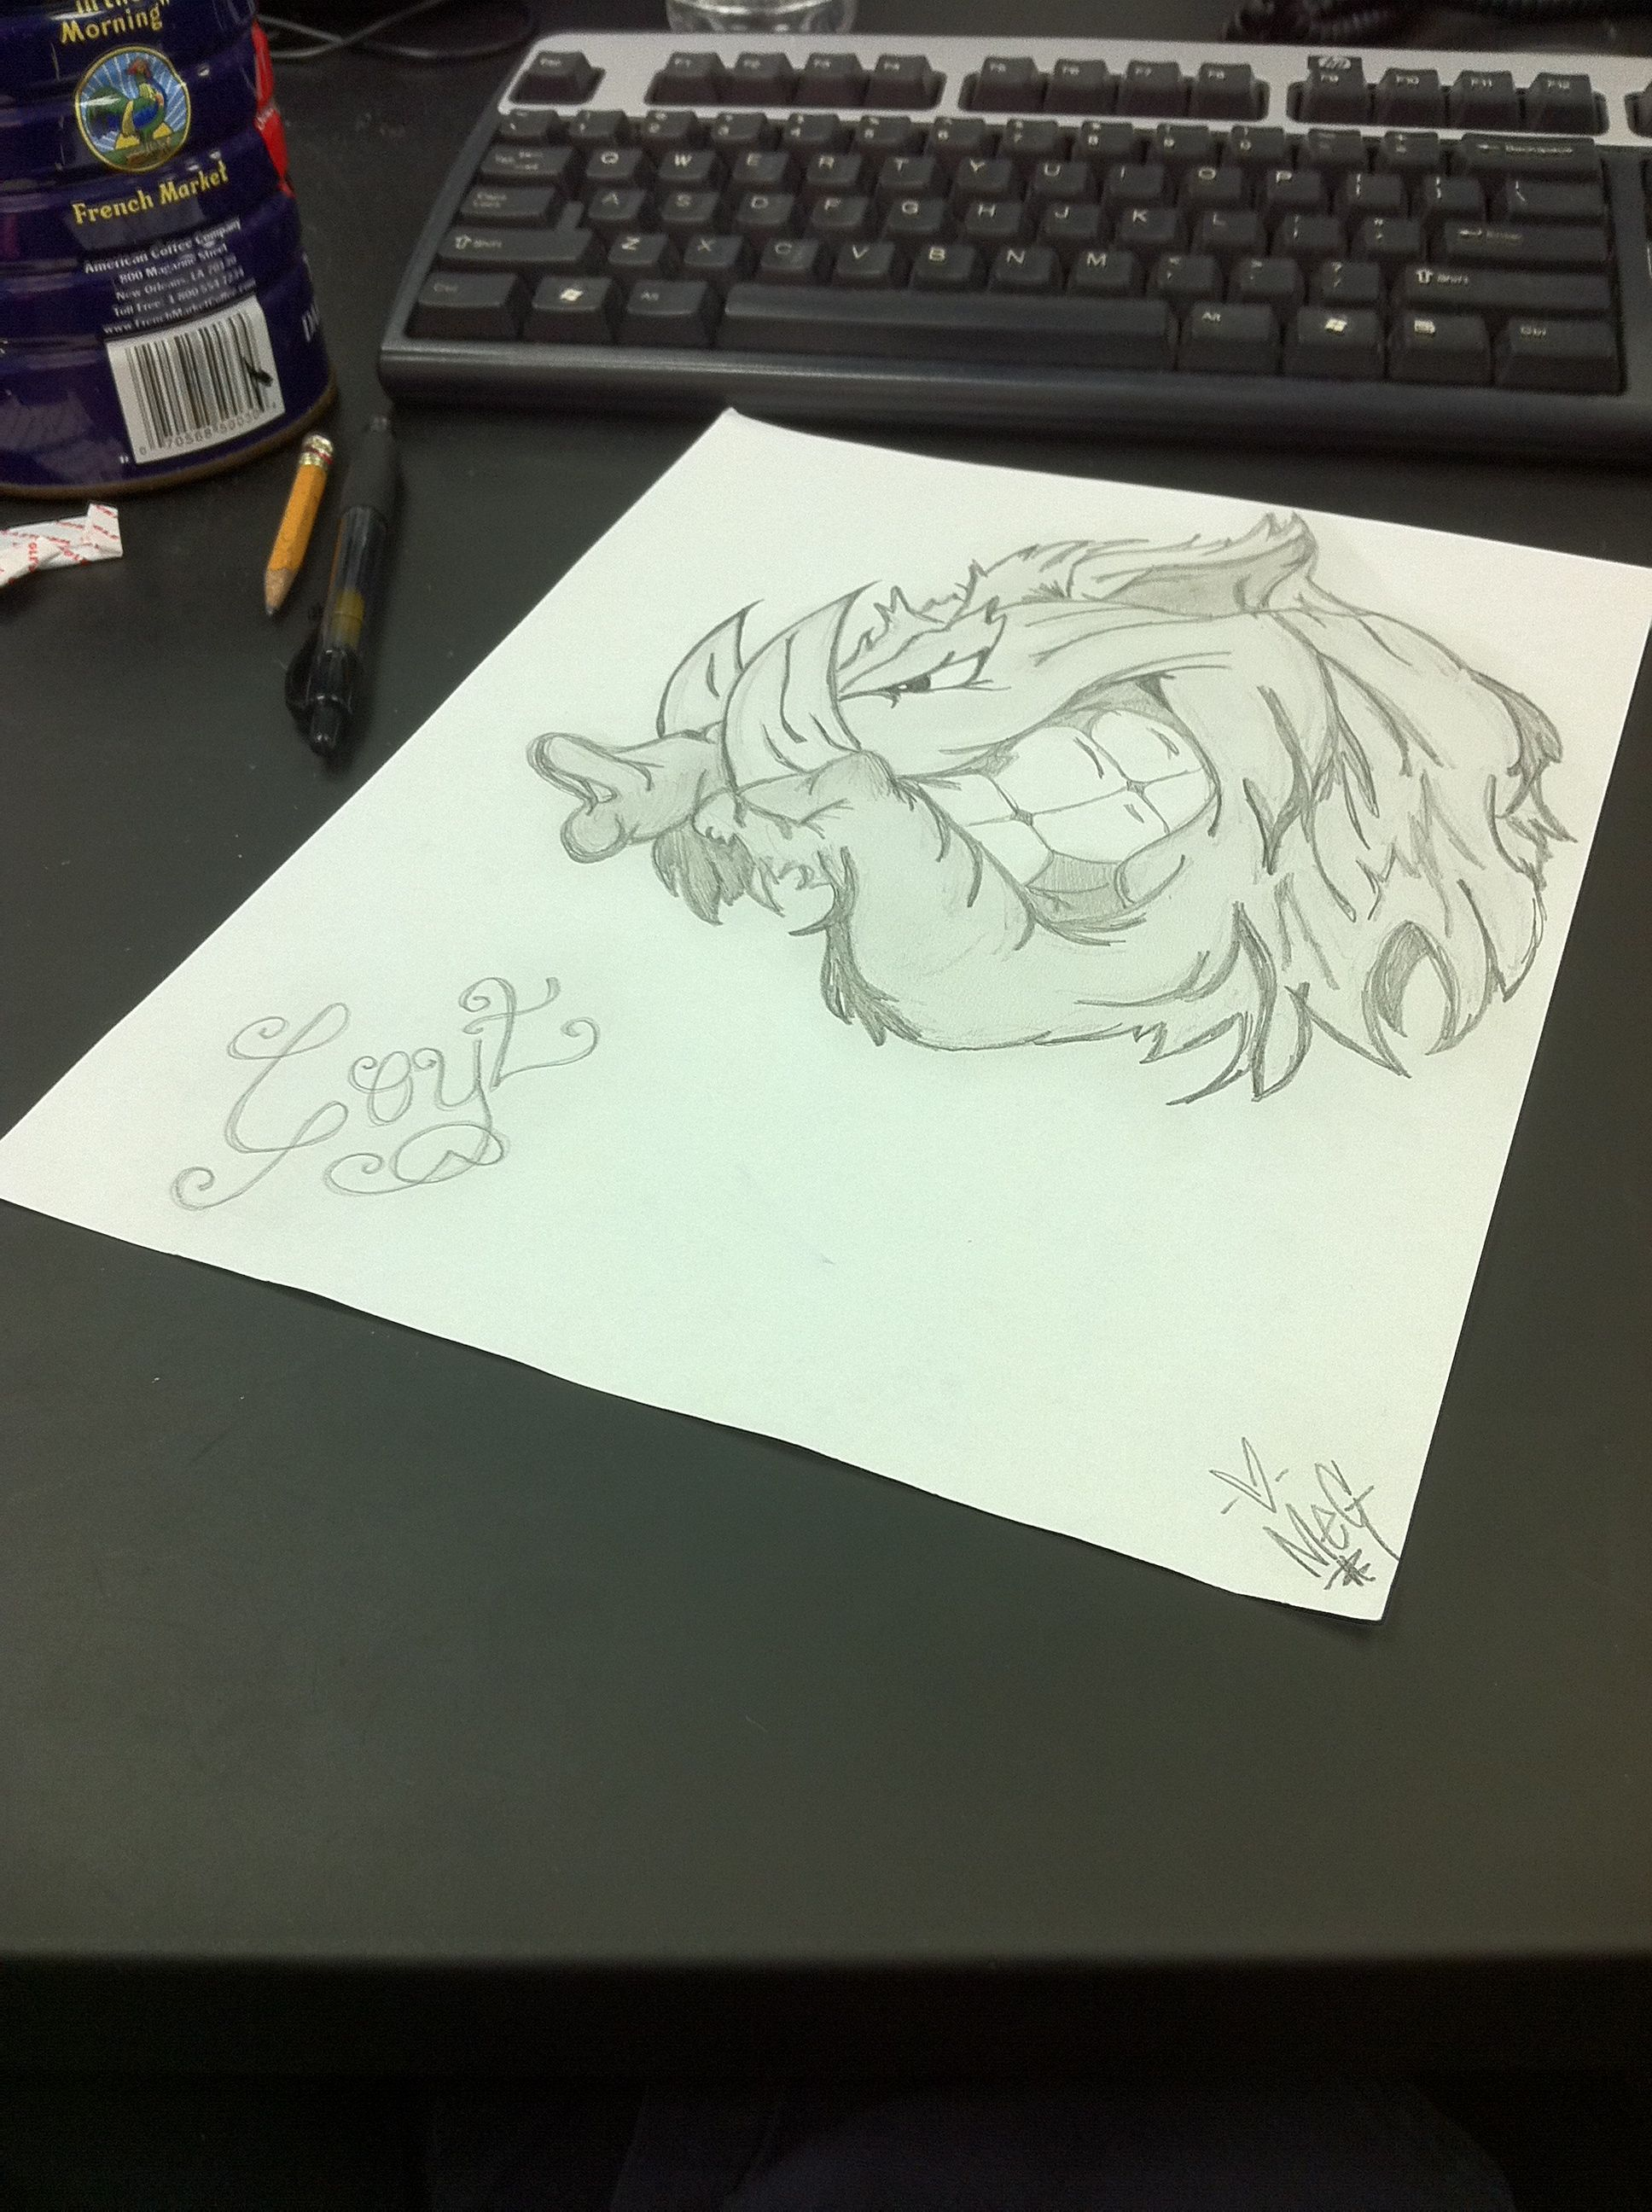 nightshift doodling